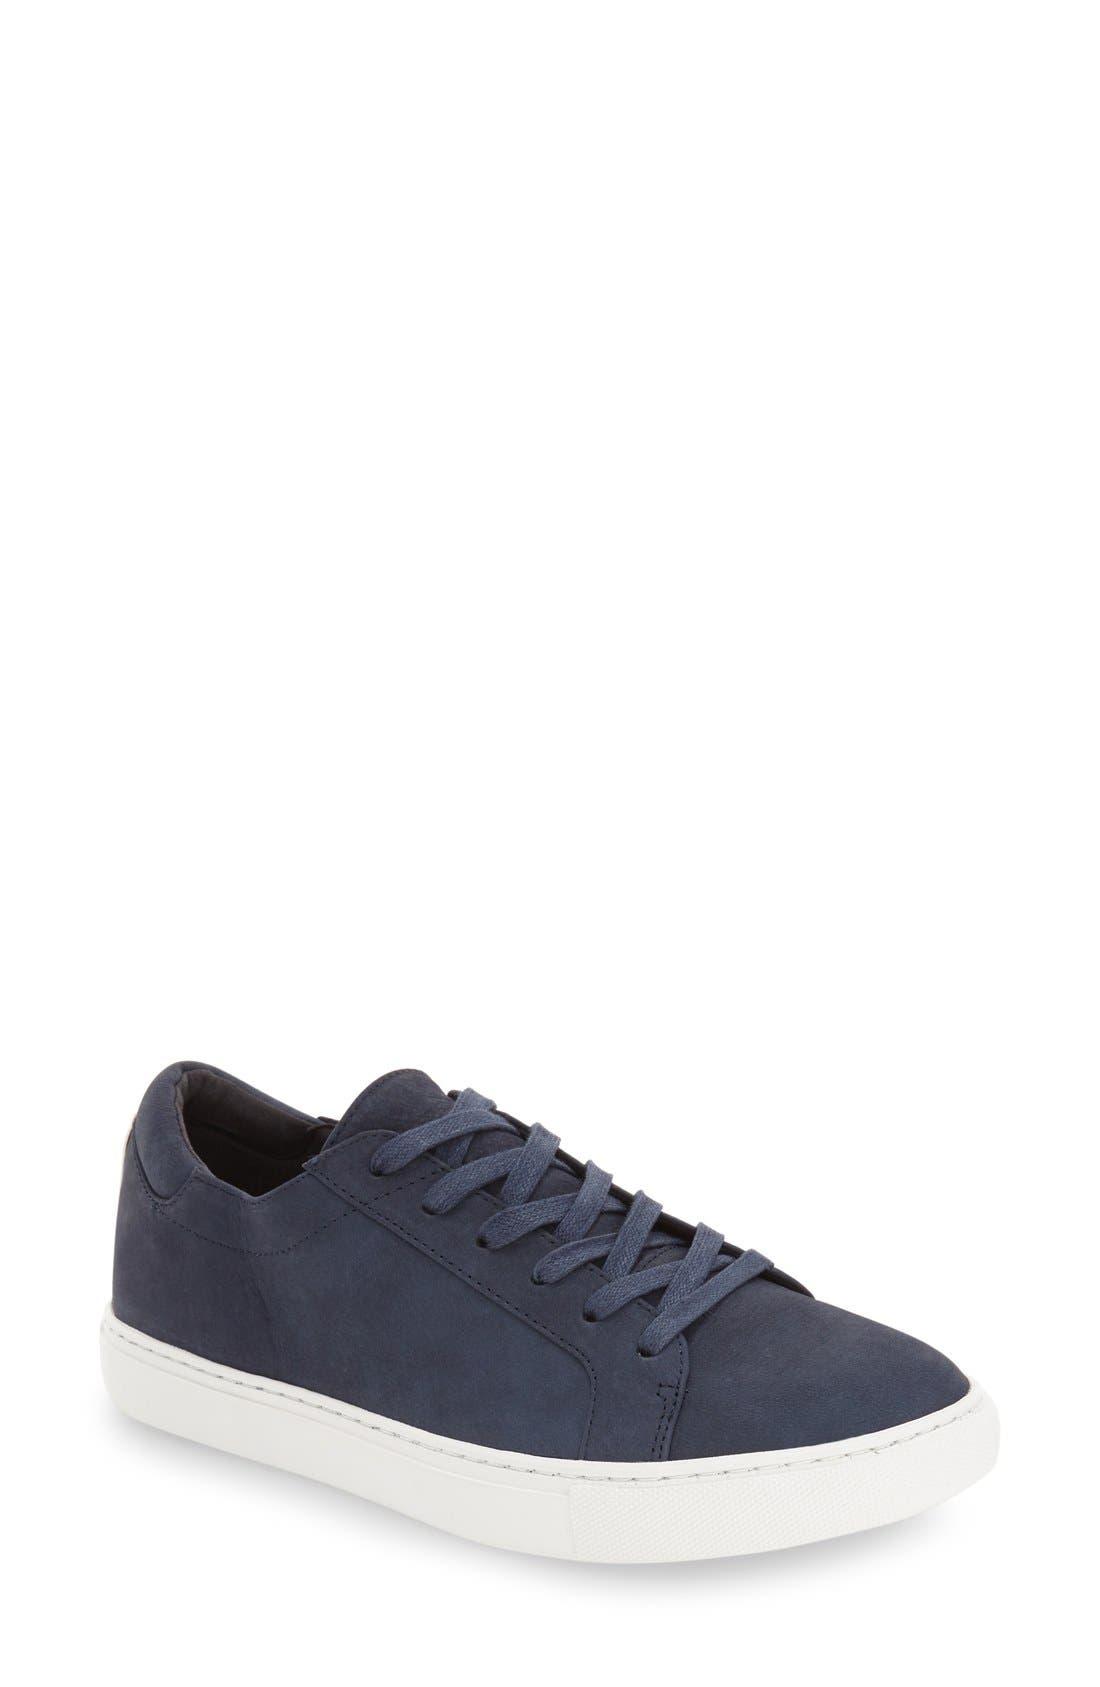 'Kam' Sneaker,                             Main thumbnail 1, color,                             Navy Nubuck Leather